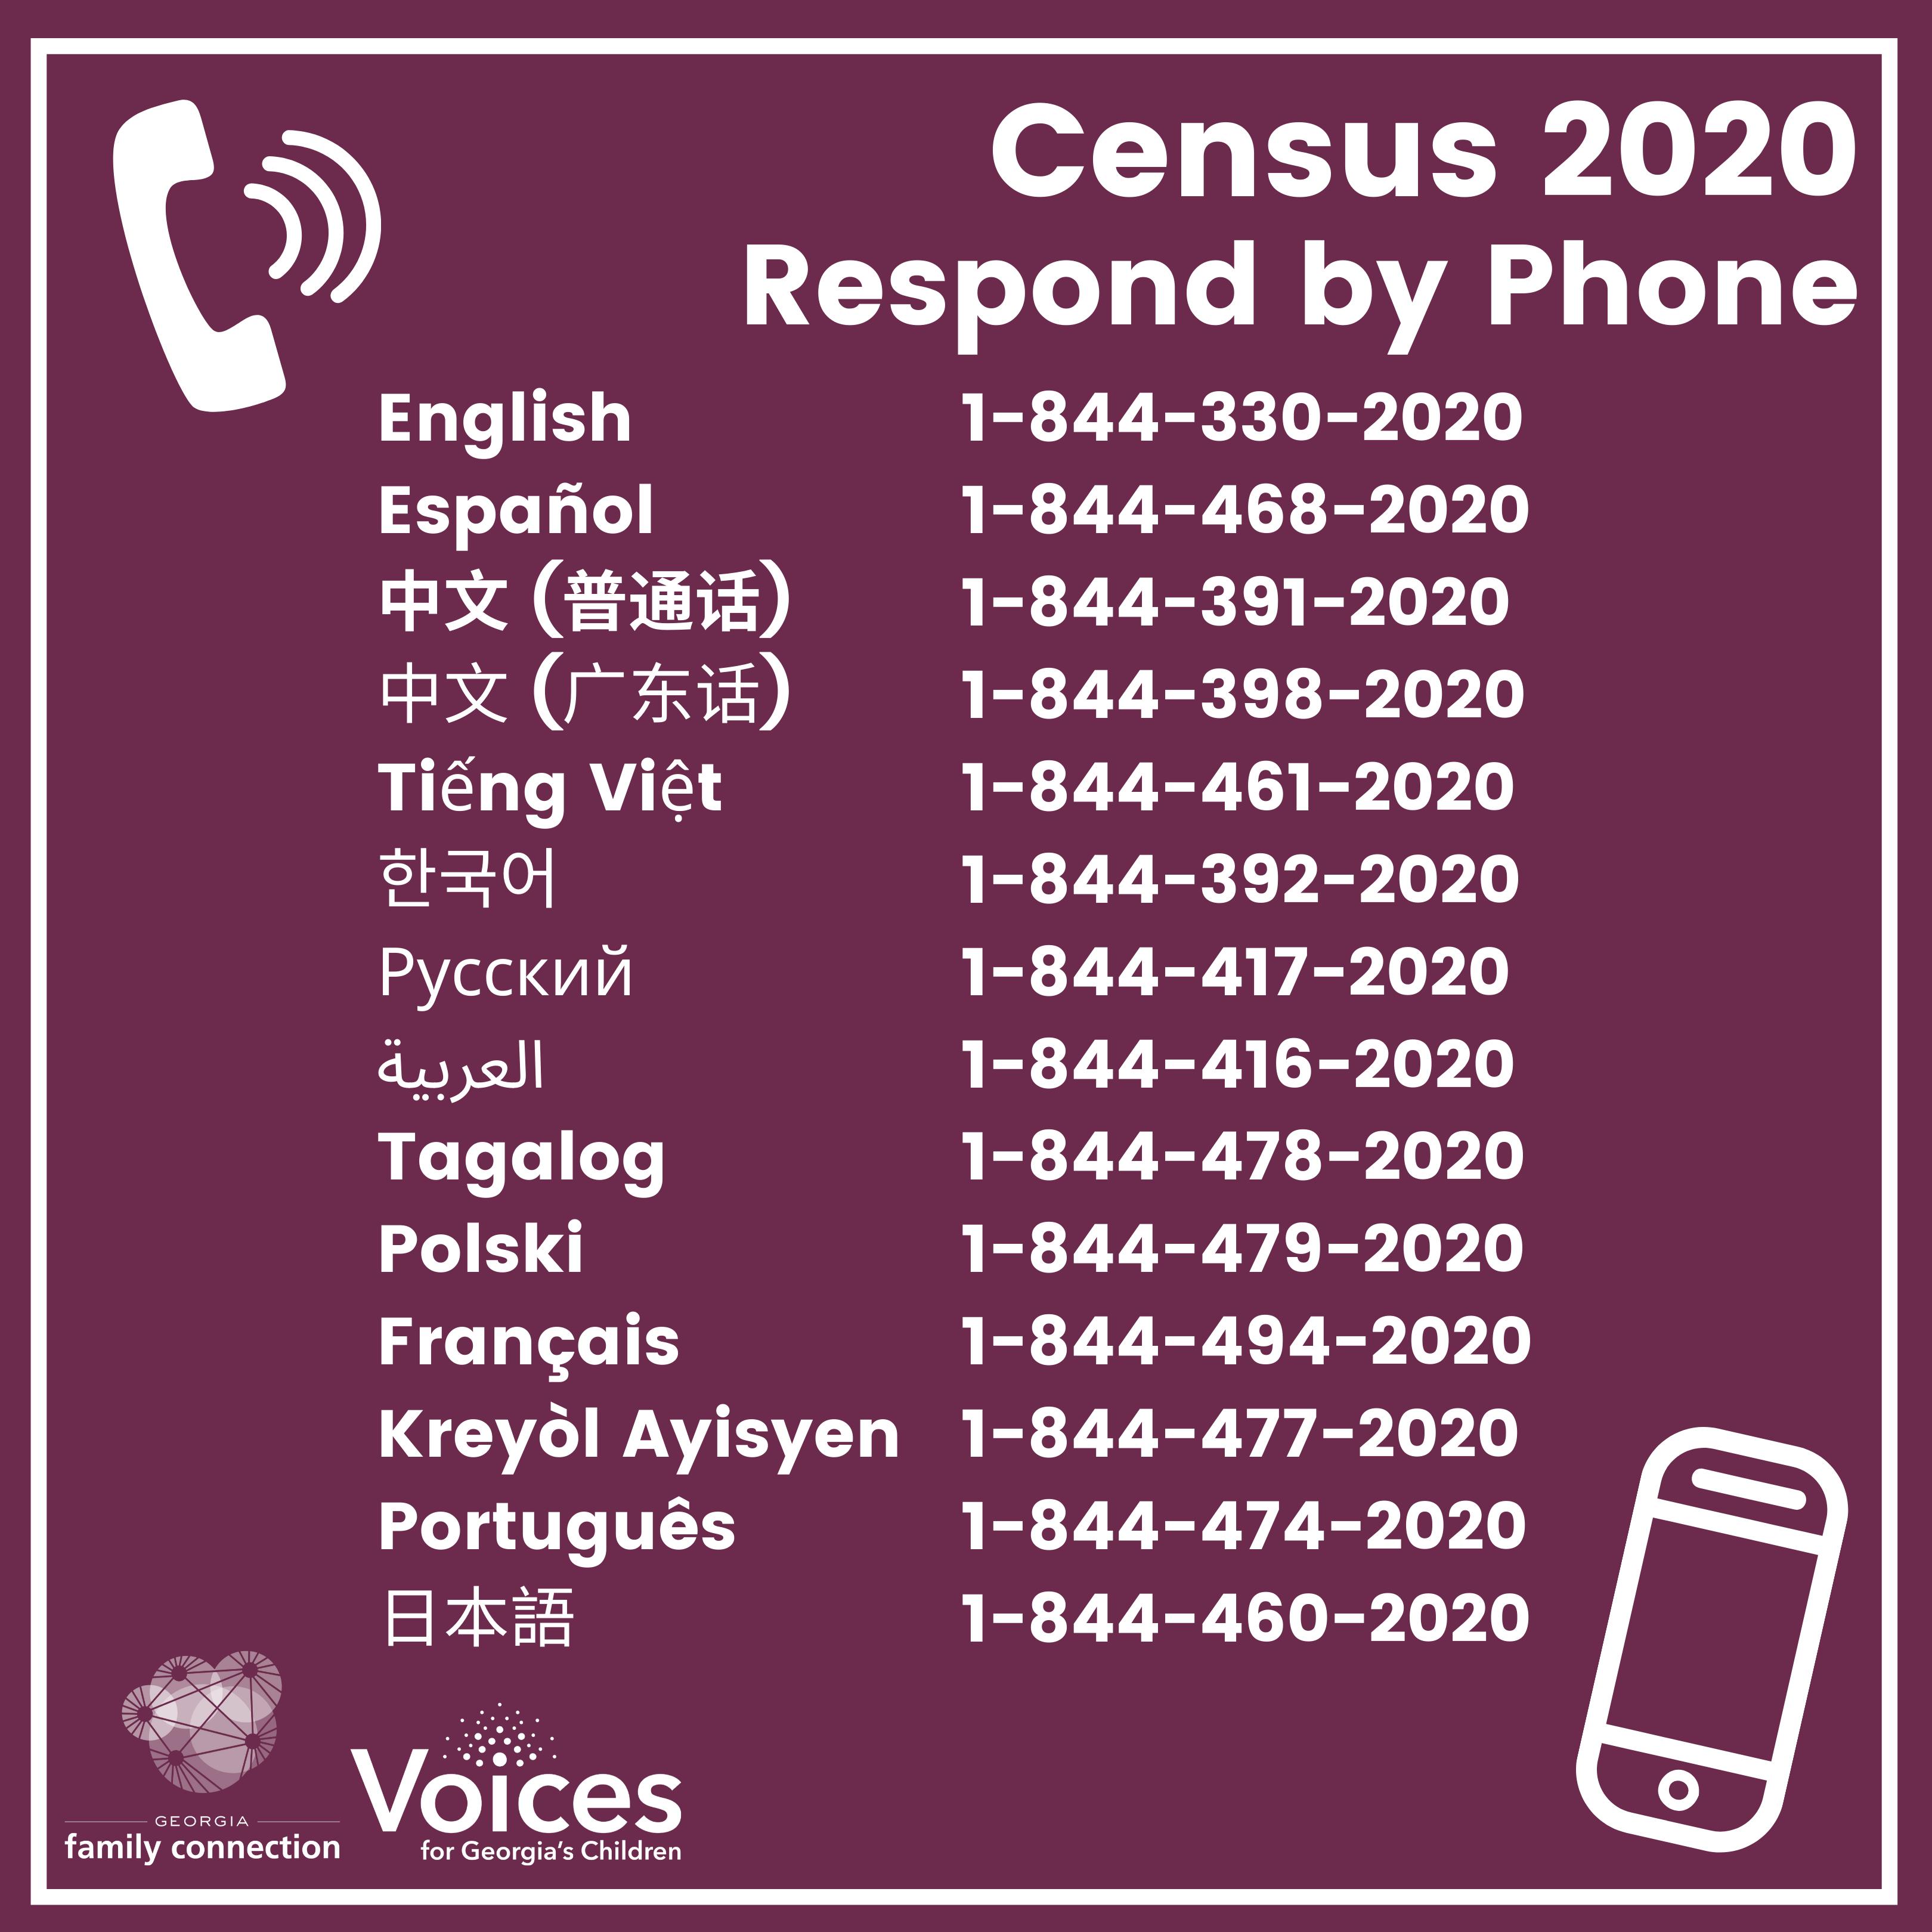 Census Phone Numbers